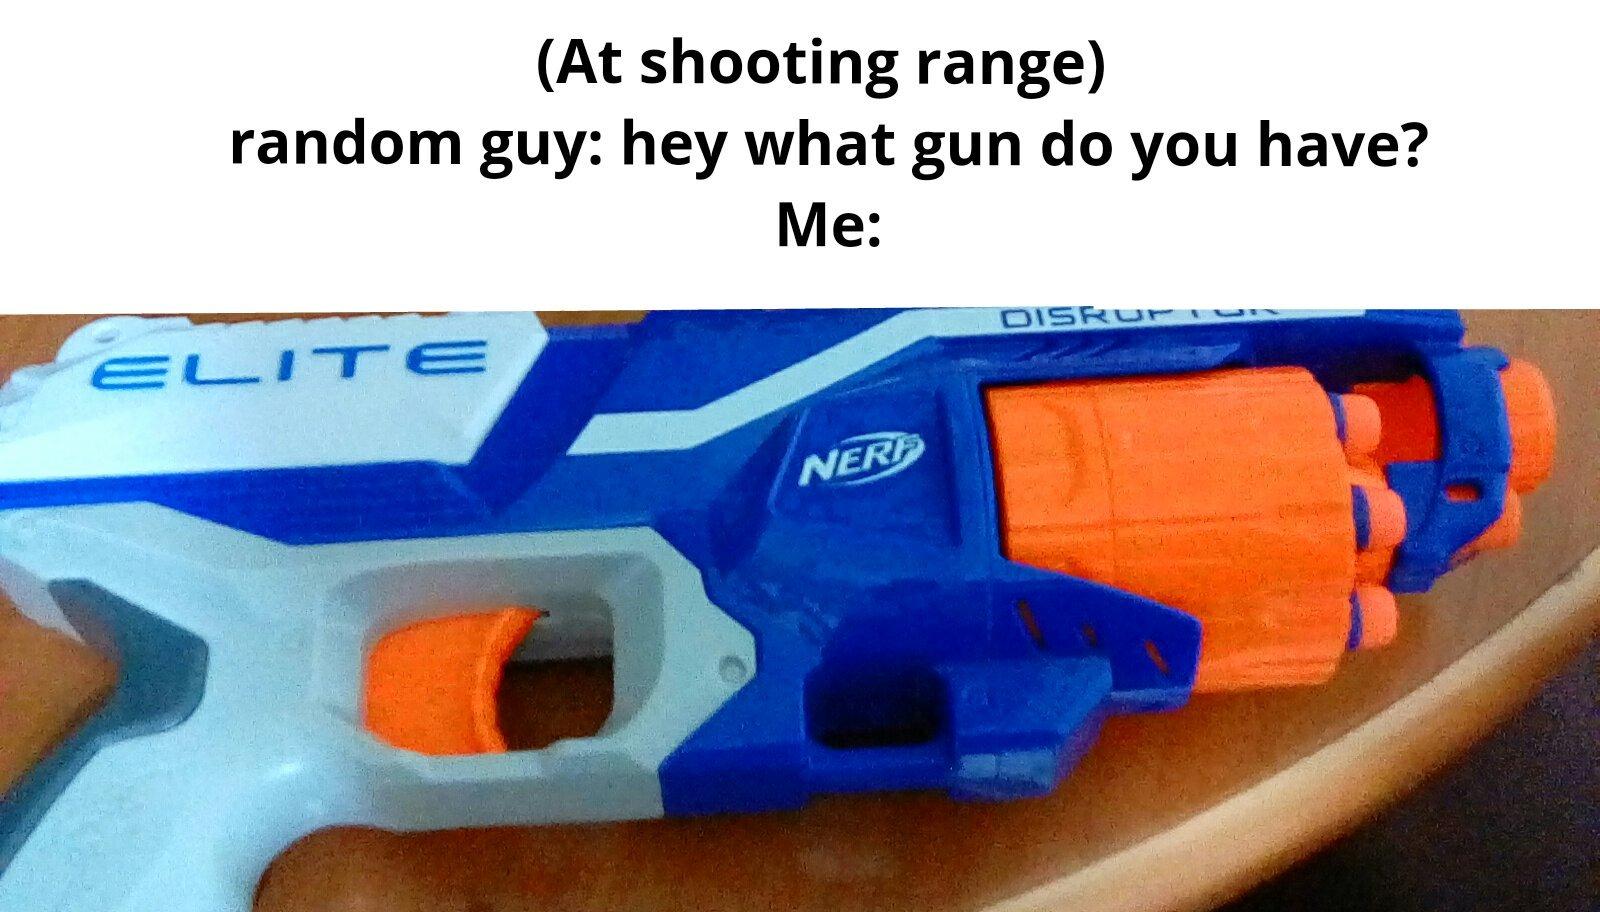 What gun u got? - meme